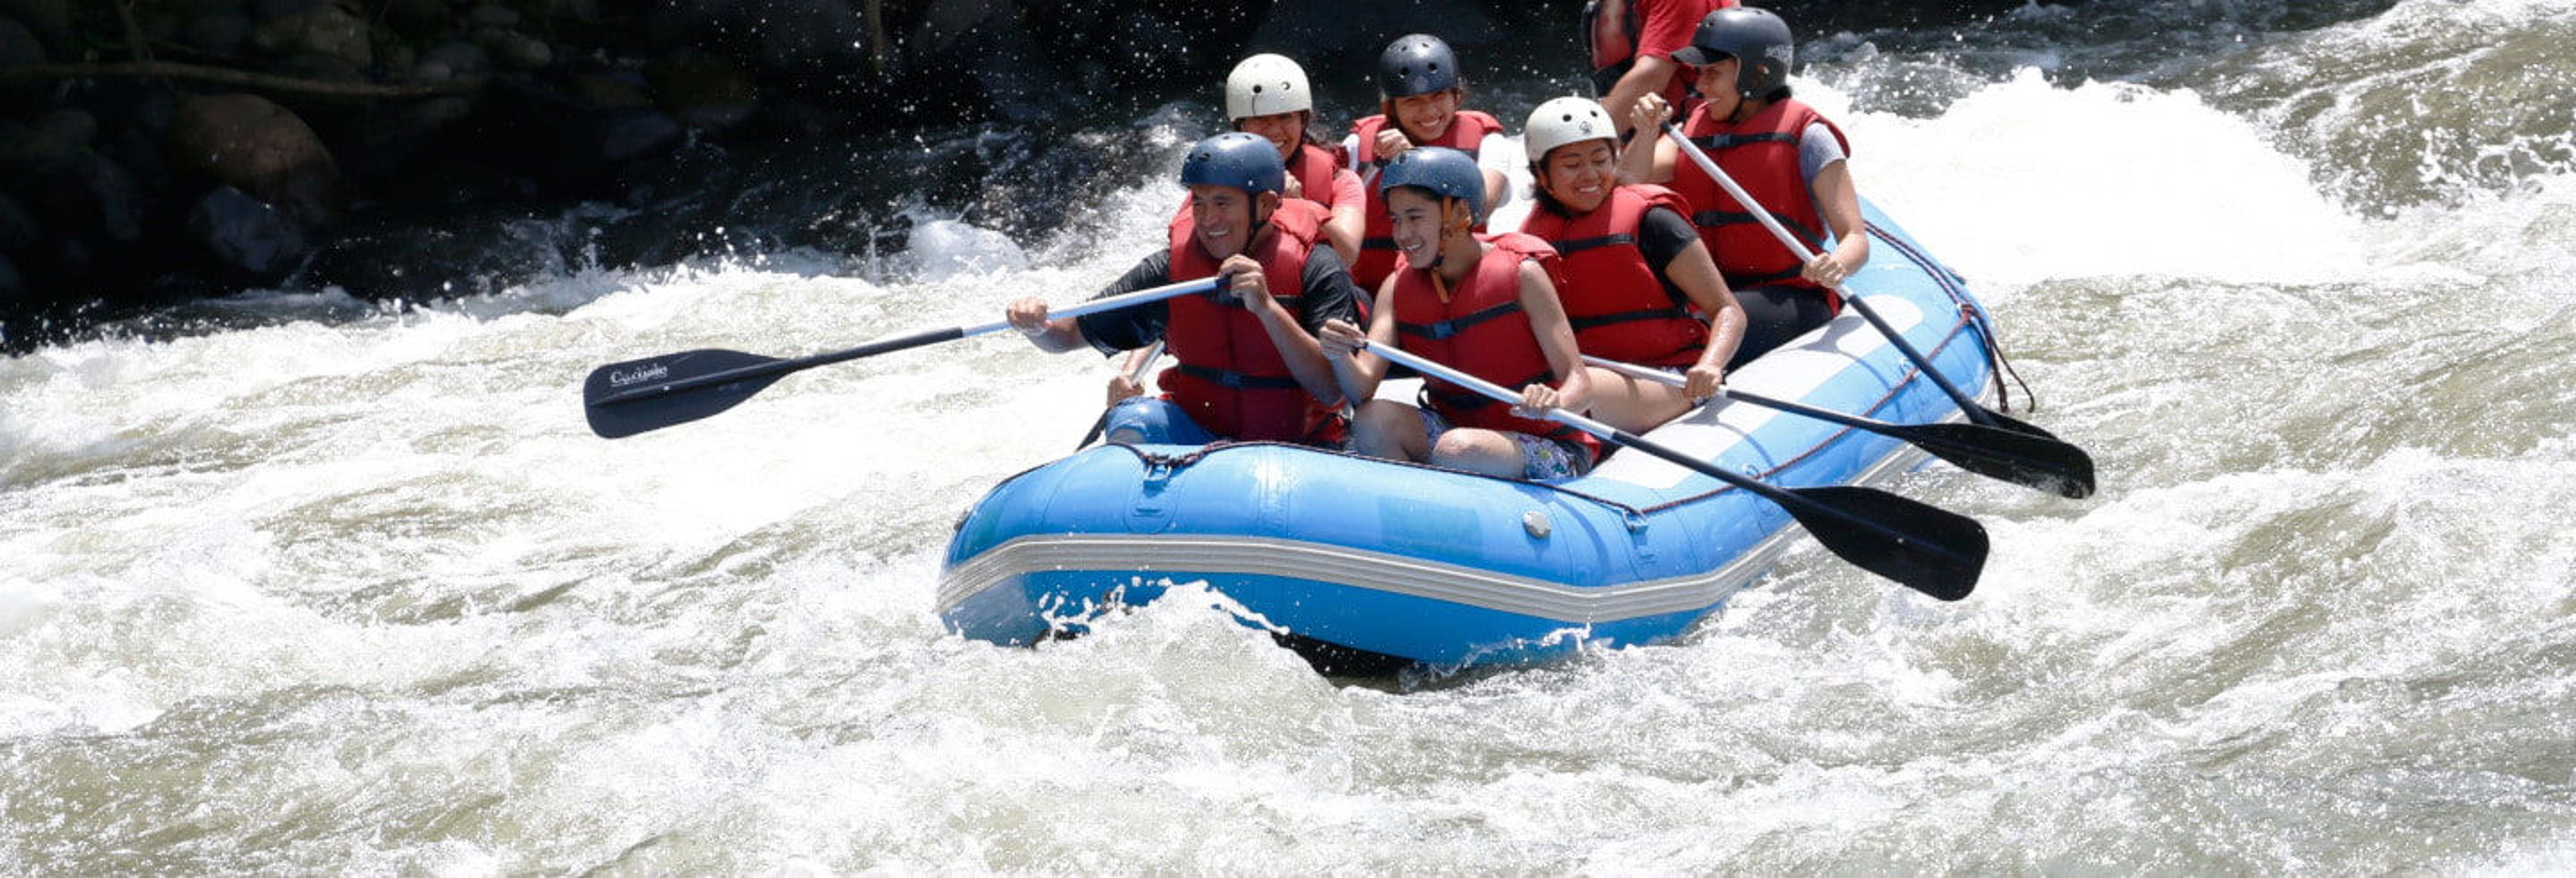 Rafting sul fiume Pescados